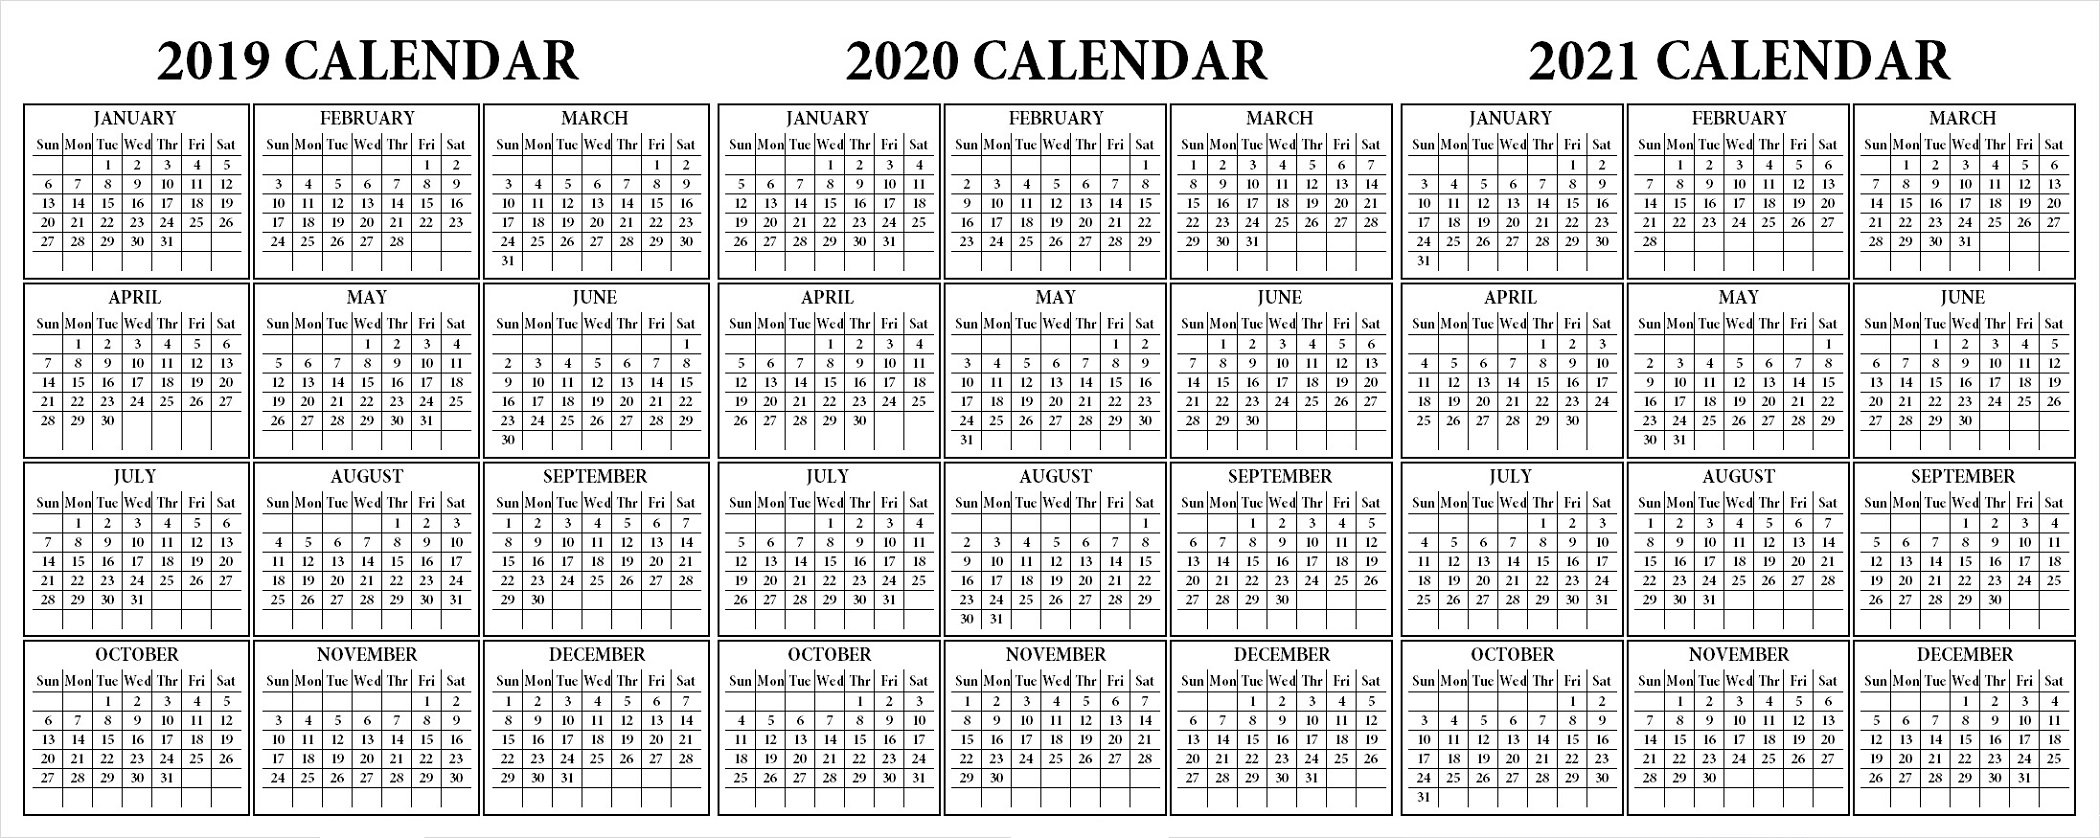 Three-Year Calendar 2019 2020 2021 - Calendar Inspiration Design throughout Three Year Calendar 2019 2021 2021 Calendar Pedia Image